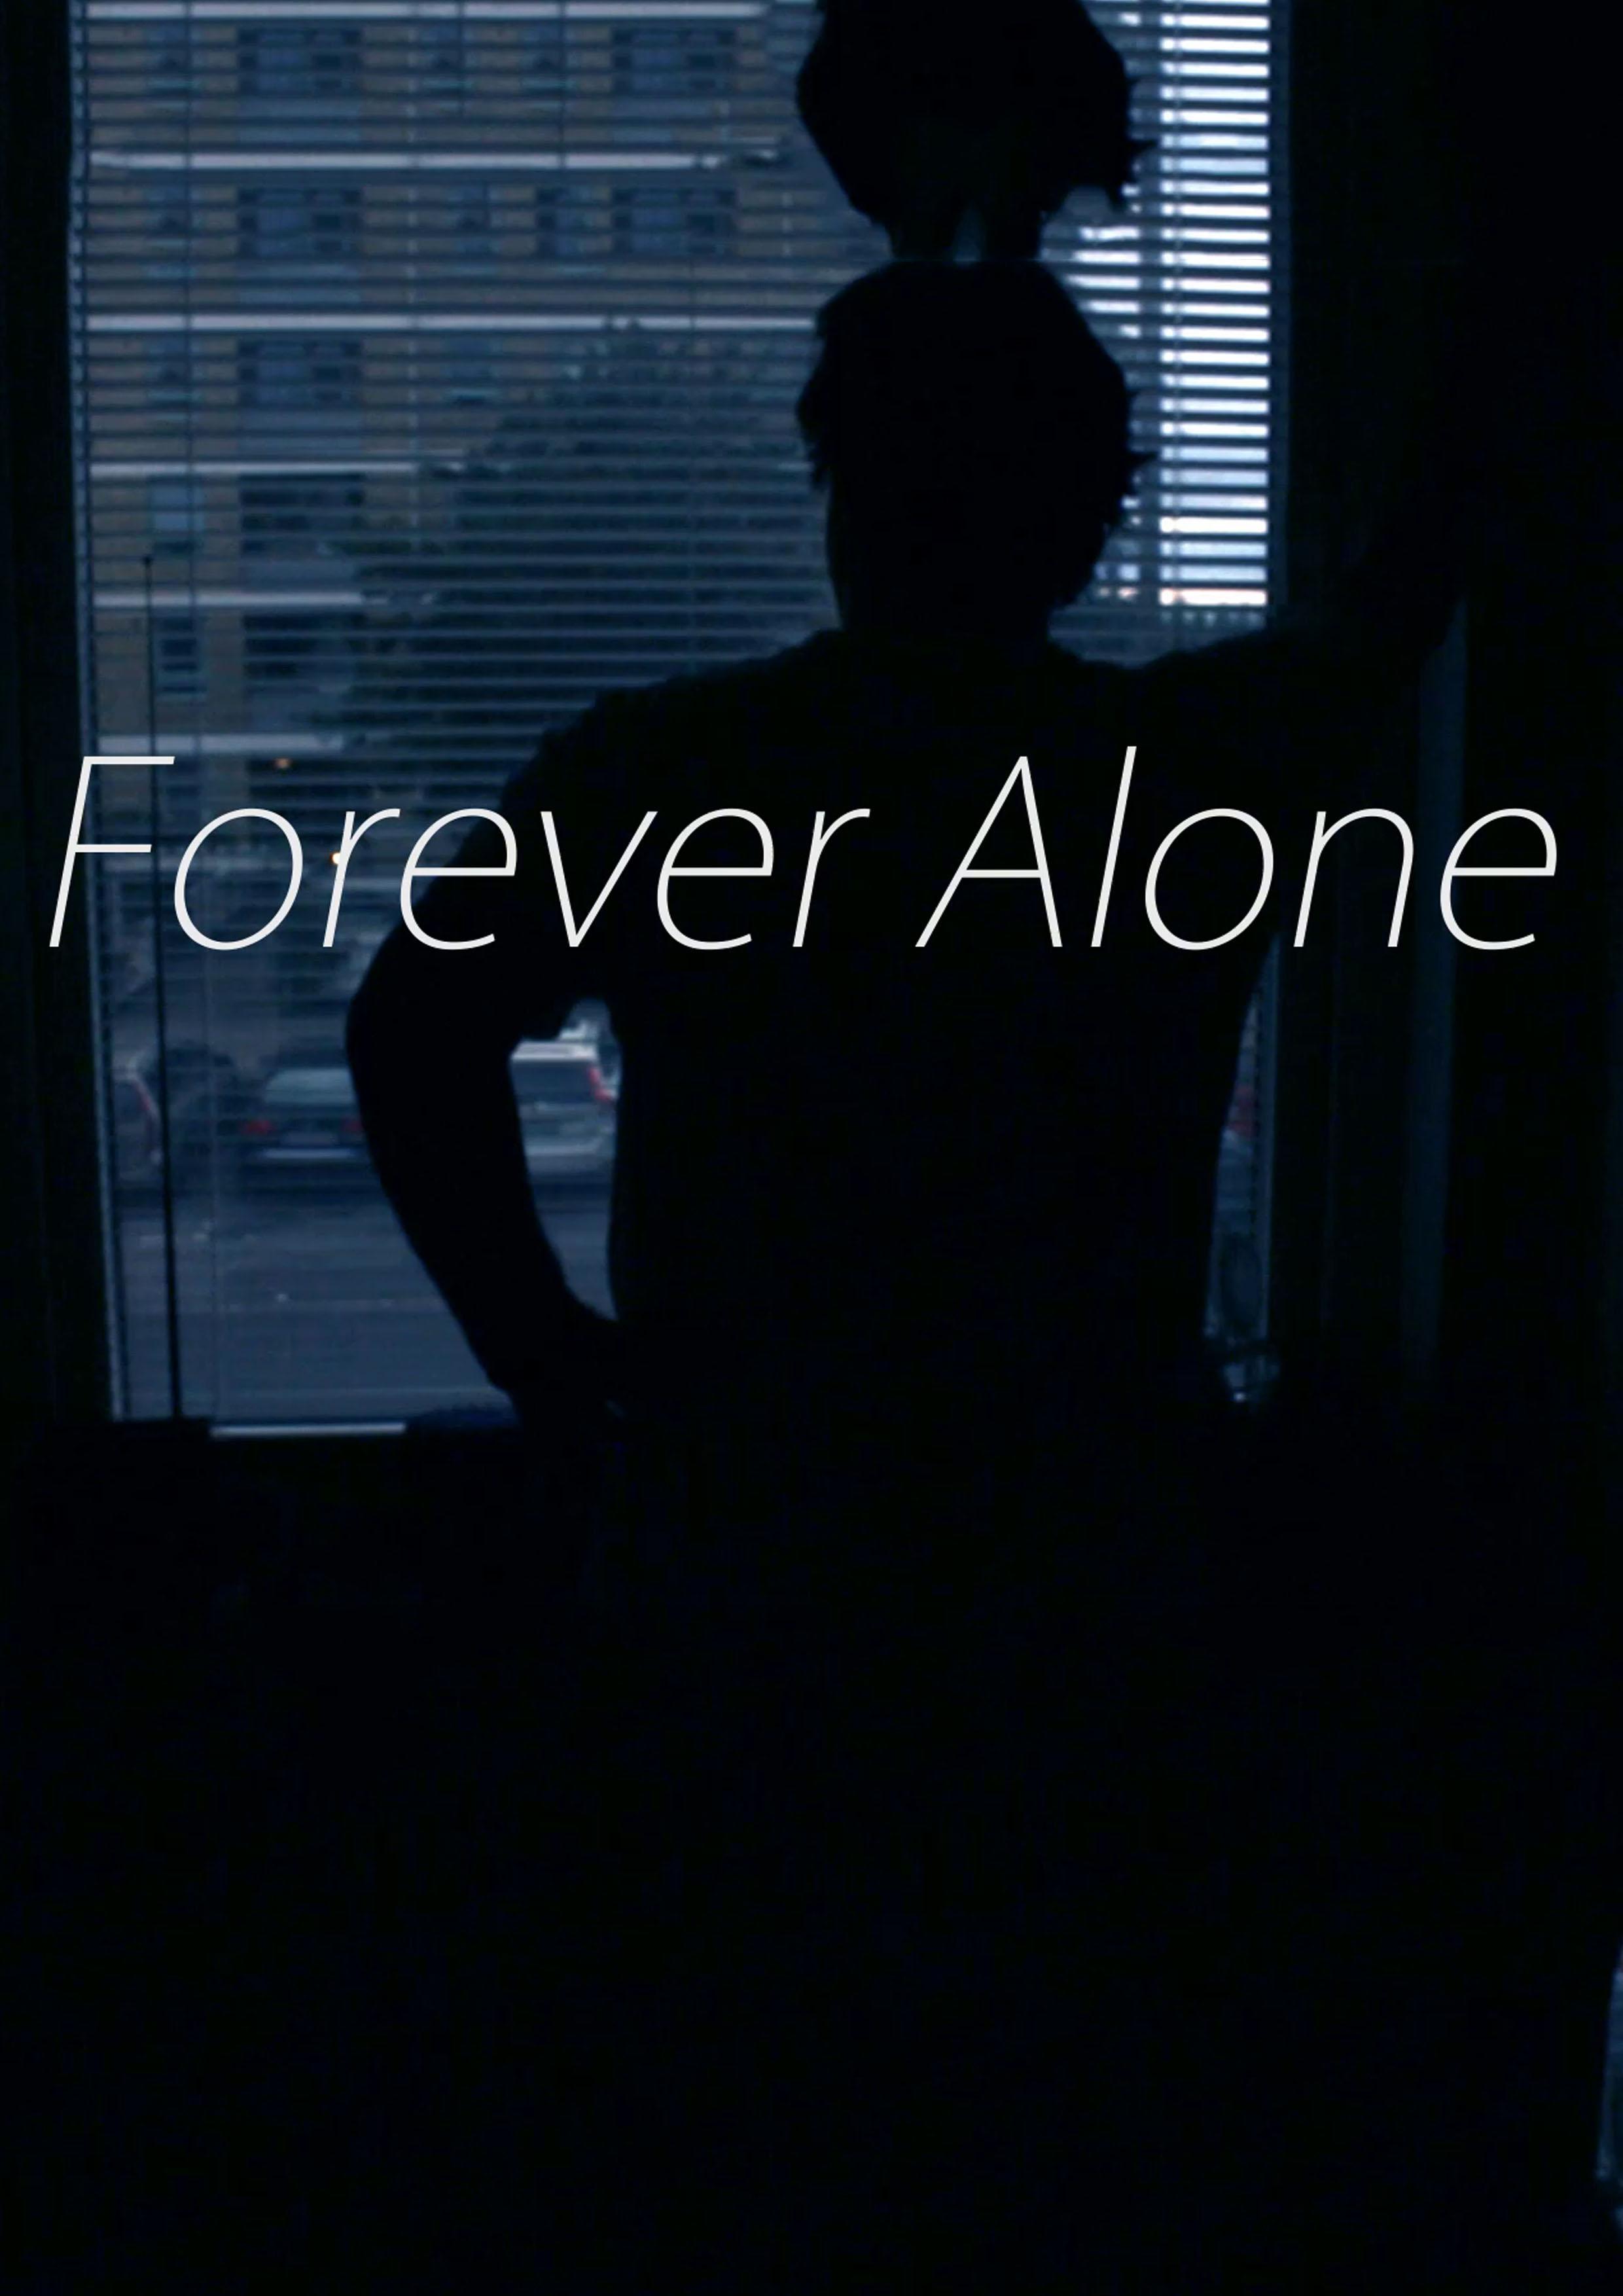 forever alone 2016 imdb